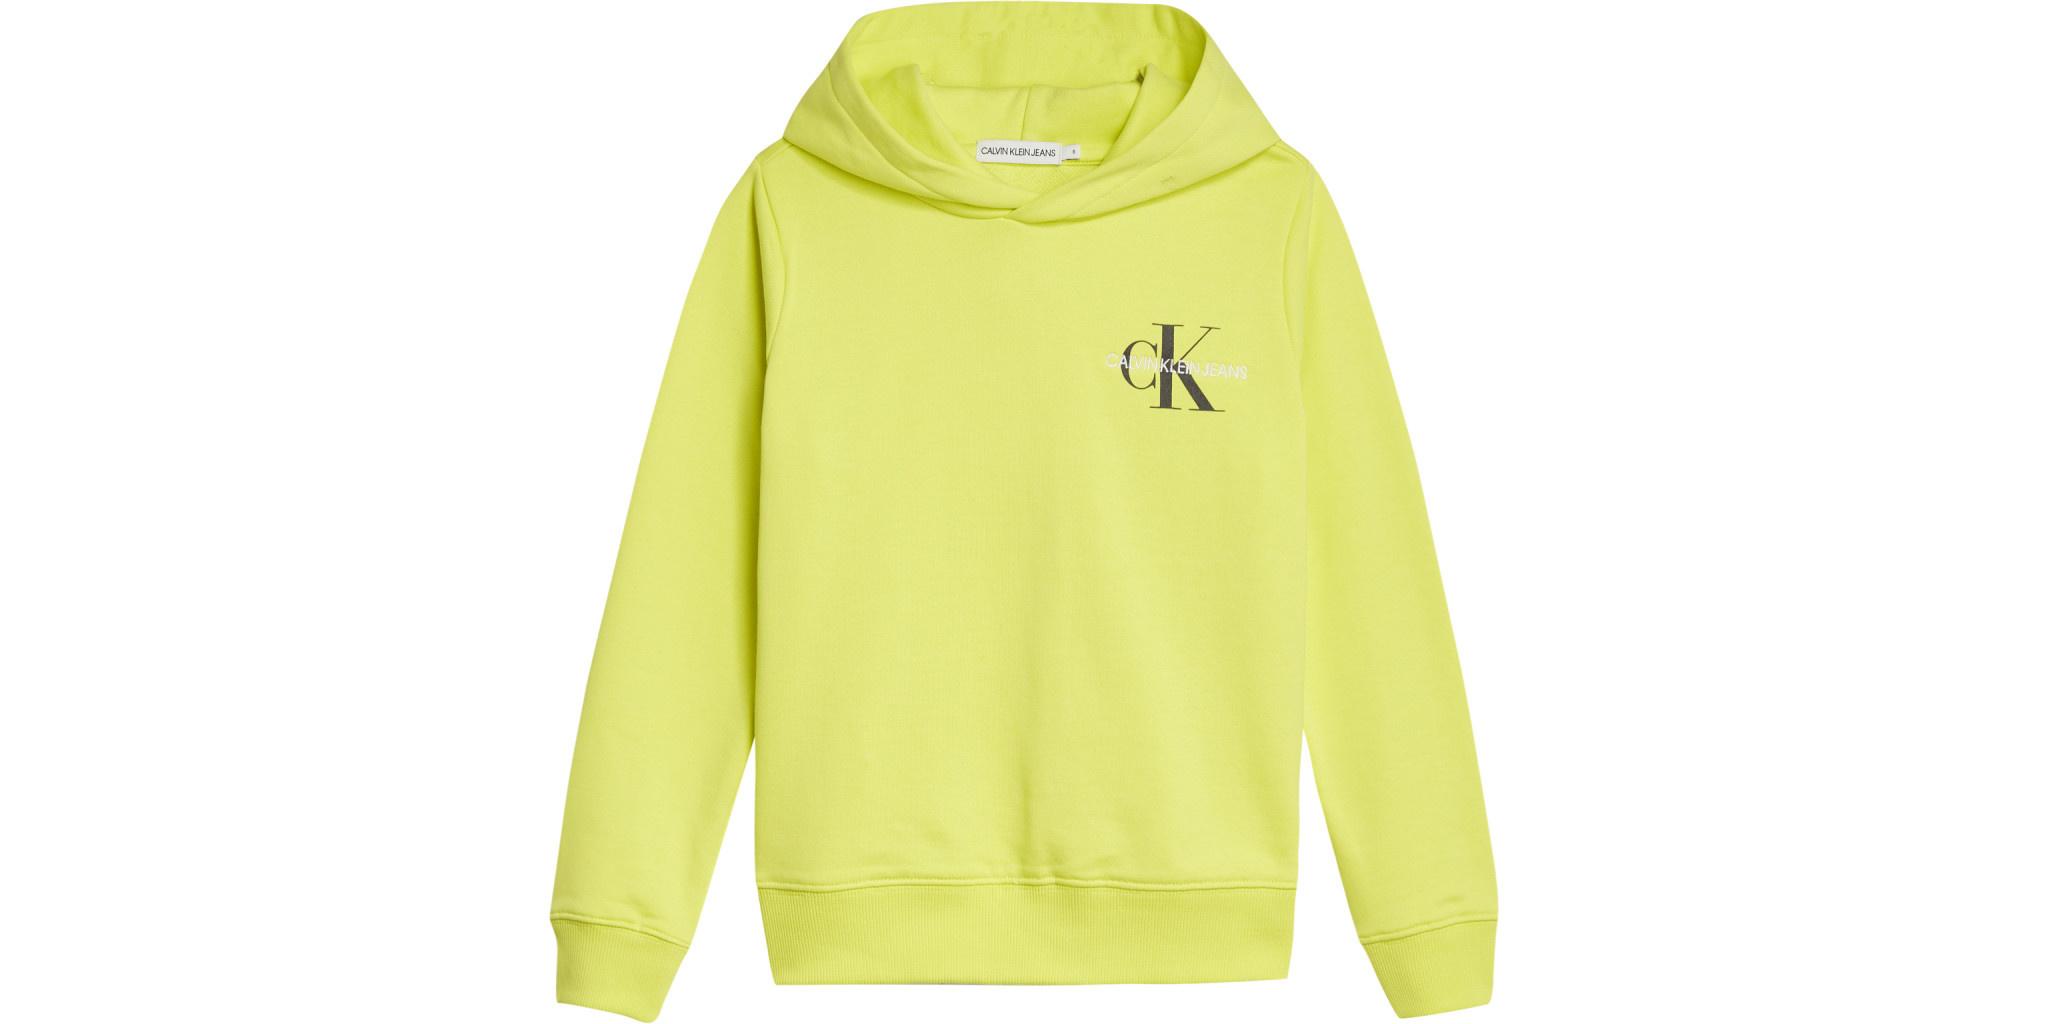 Calvin klein Calvin Klein hoodie Yelow Lime IU0IU00164 Z21B